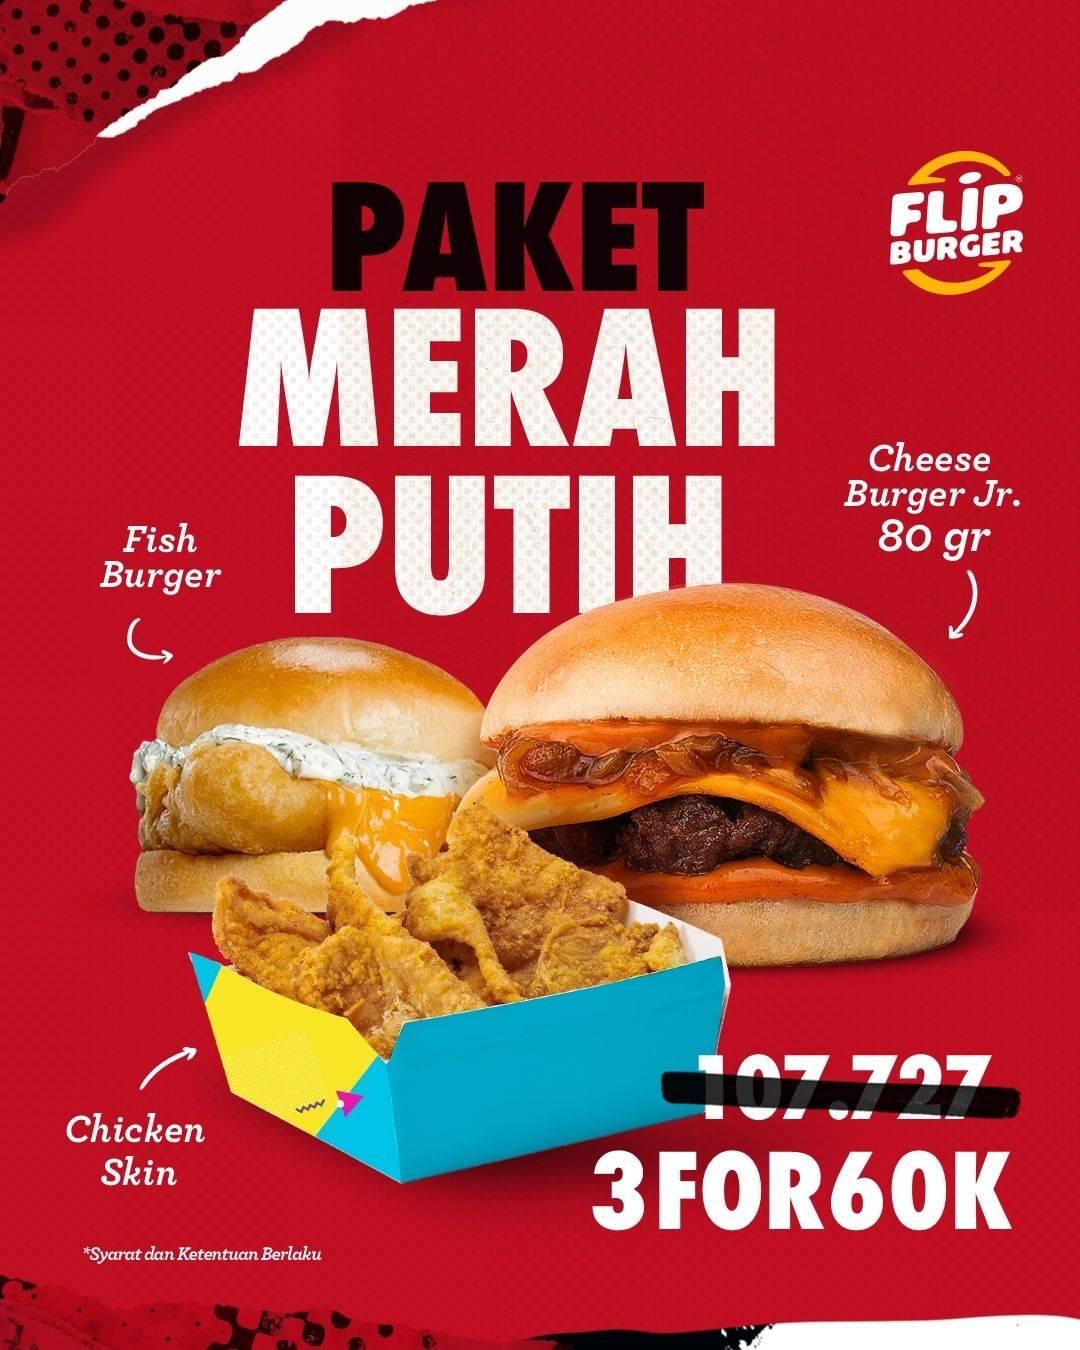 Diskon Flip Burger Paket Merah Putih 3 for 60k Aja!!